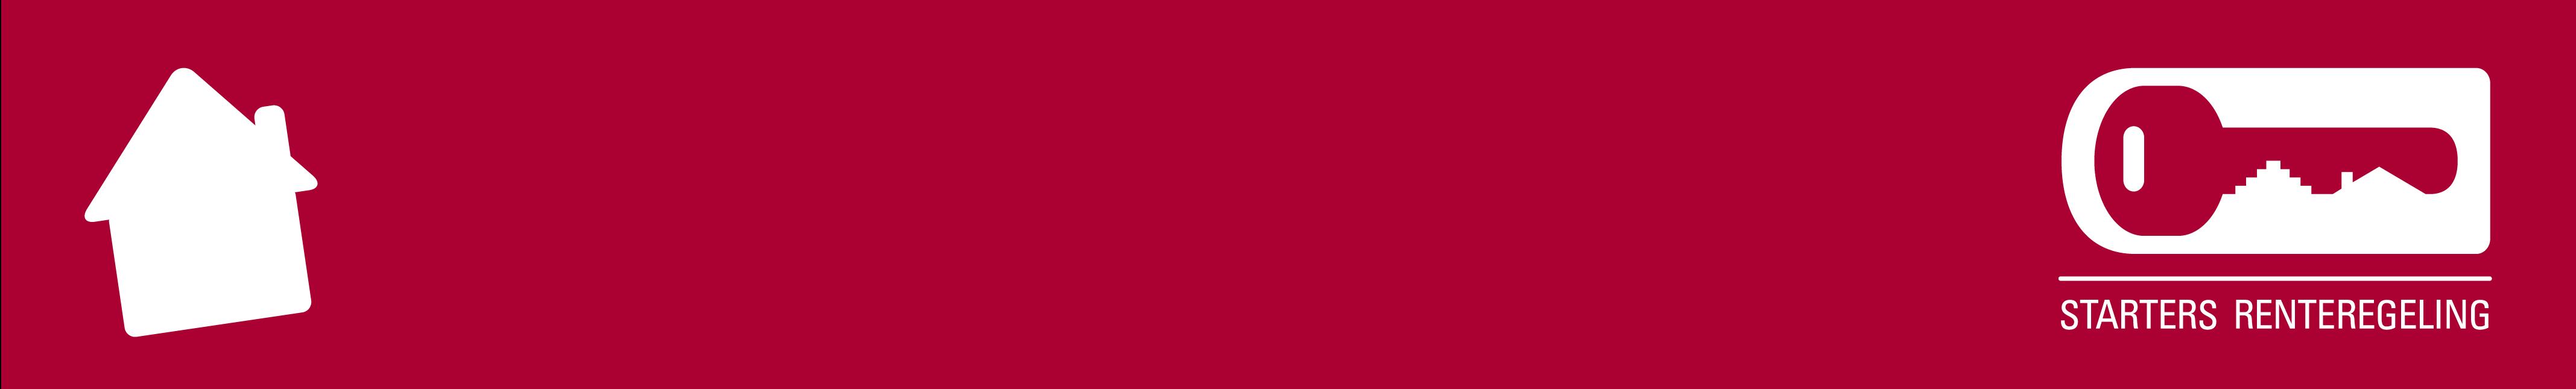 Starters Renteregeling Logo